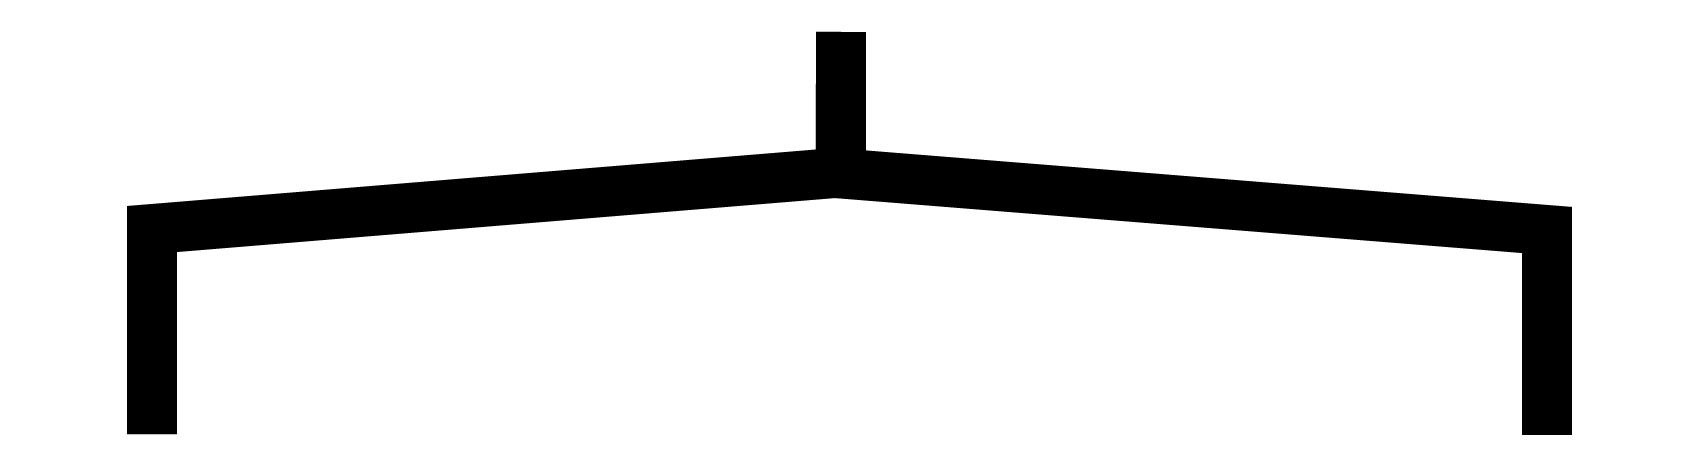 lines-32